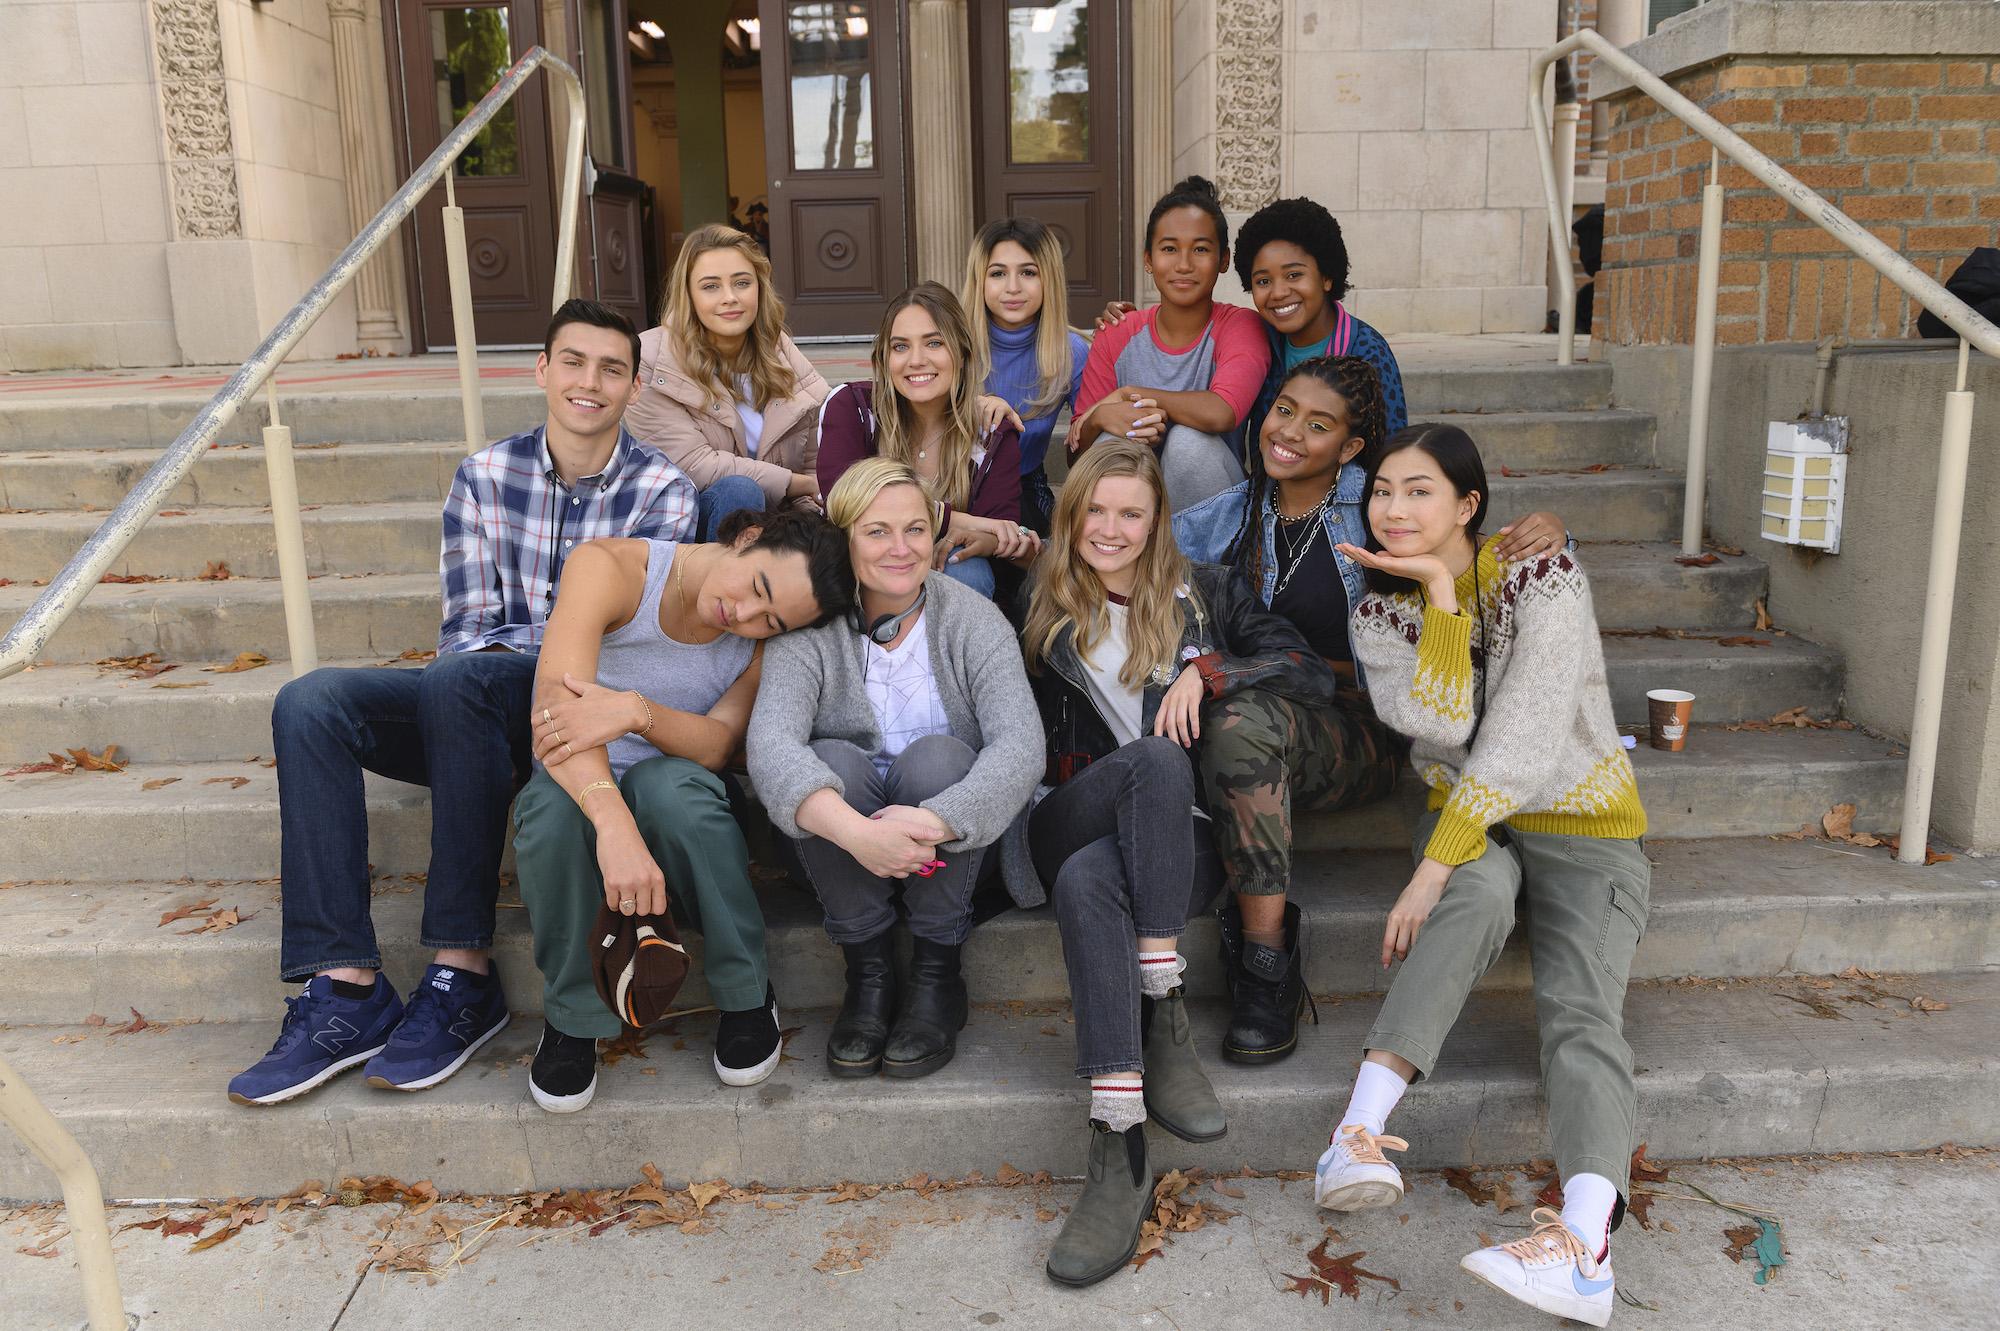 The cast of Netflix's 'Moxie' on set with Amy Poehler